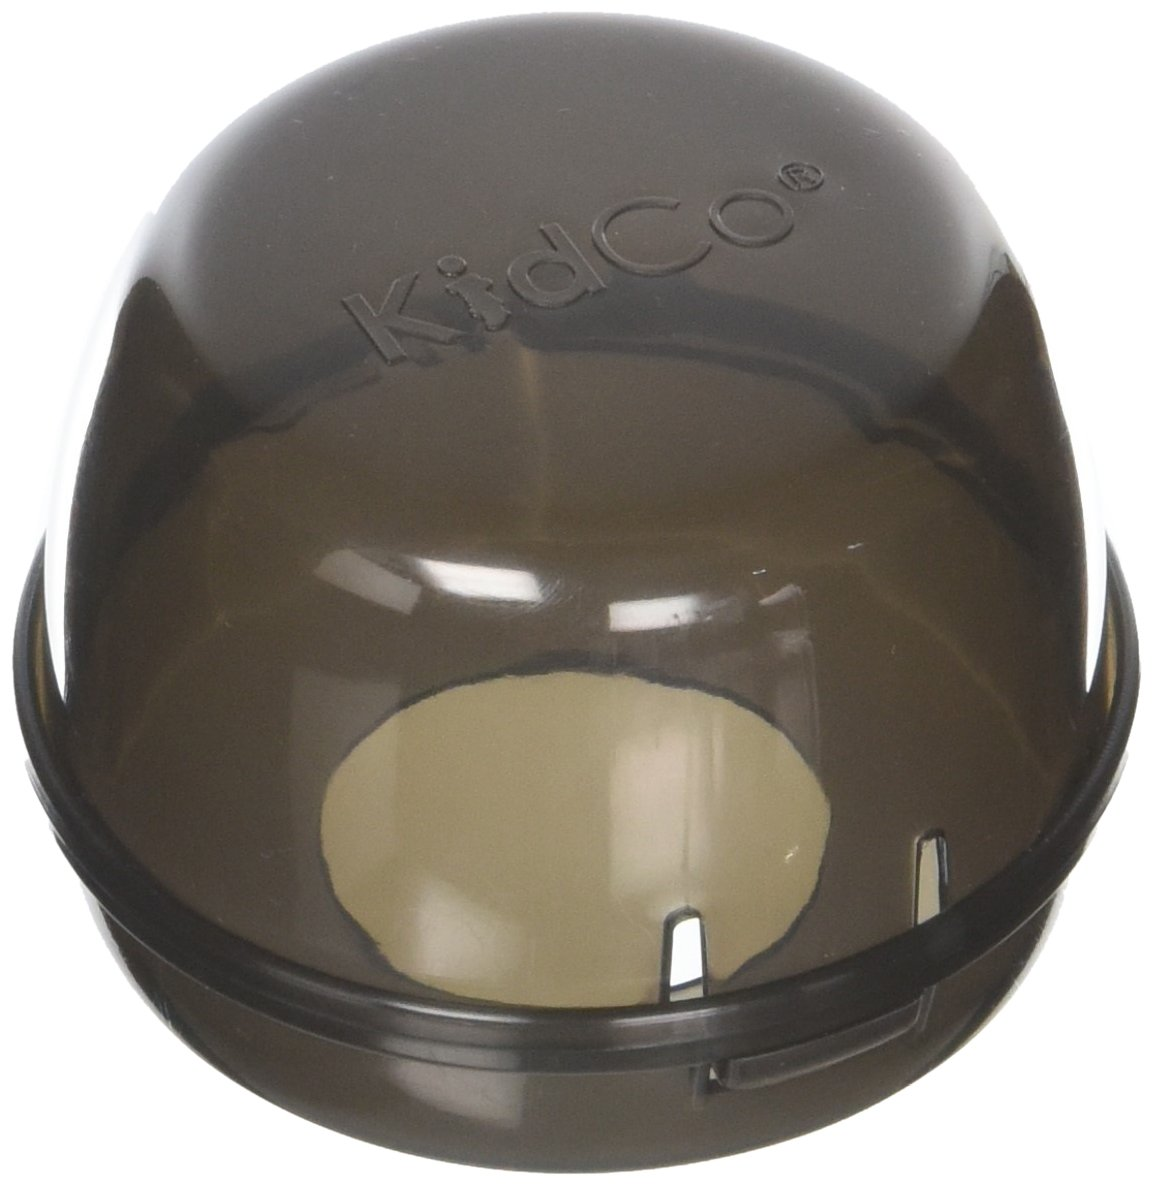 KidCo Stove Knob Covers, Charcoal S323